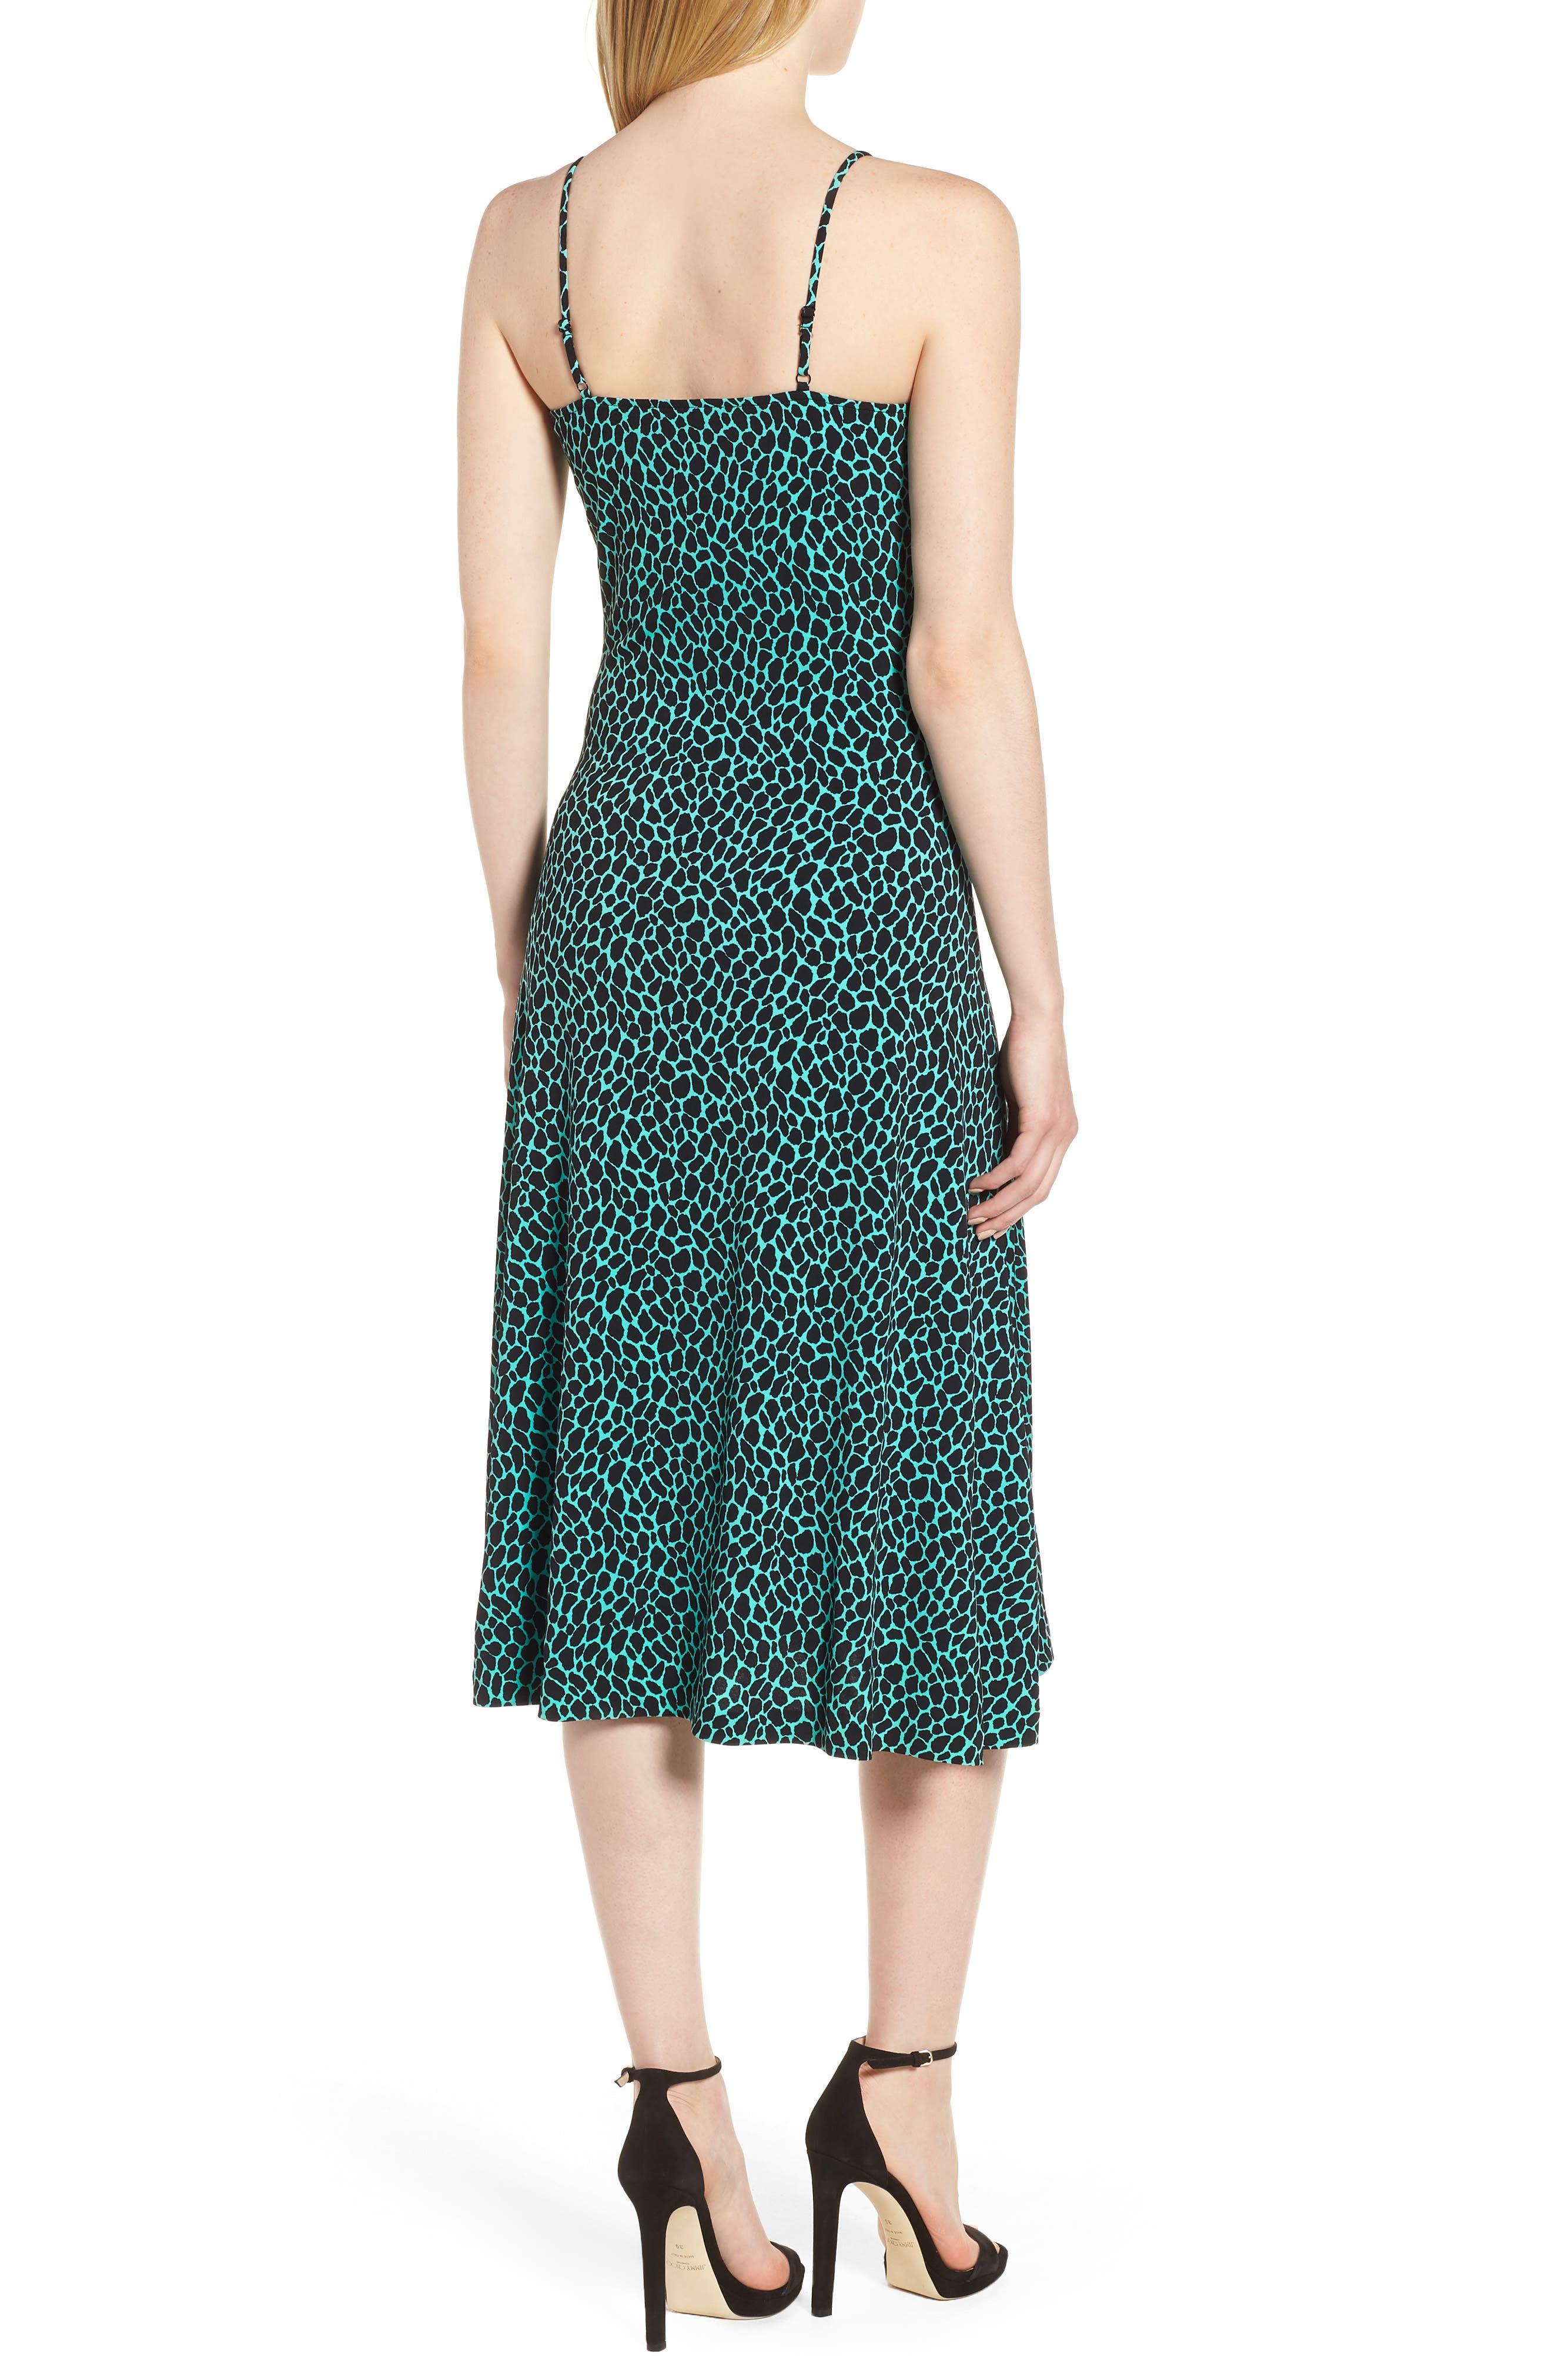 Graphic Leopard Tank Midi Dress,                             Alternate thumbnail 2, color,                             Aqua/ Black